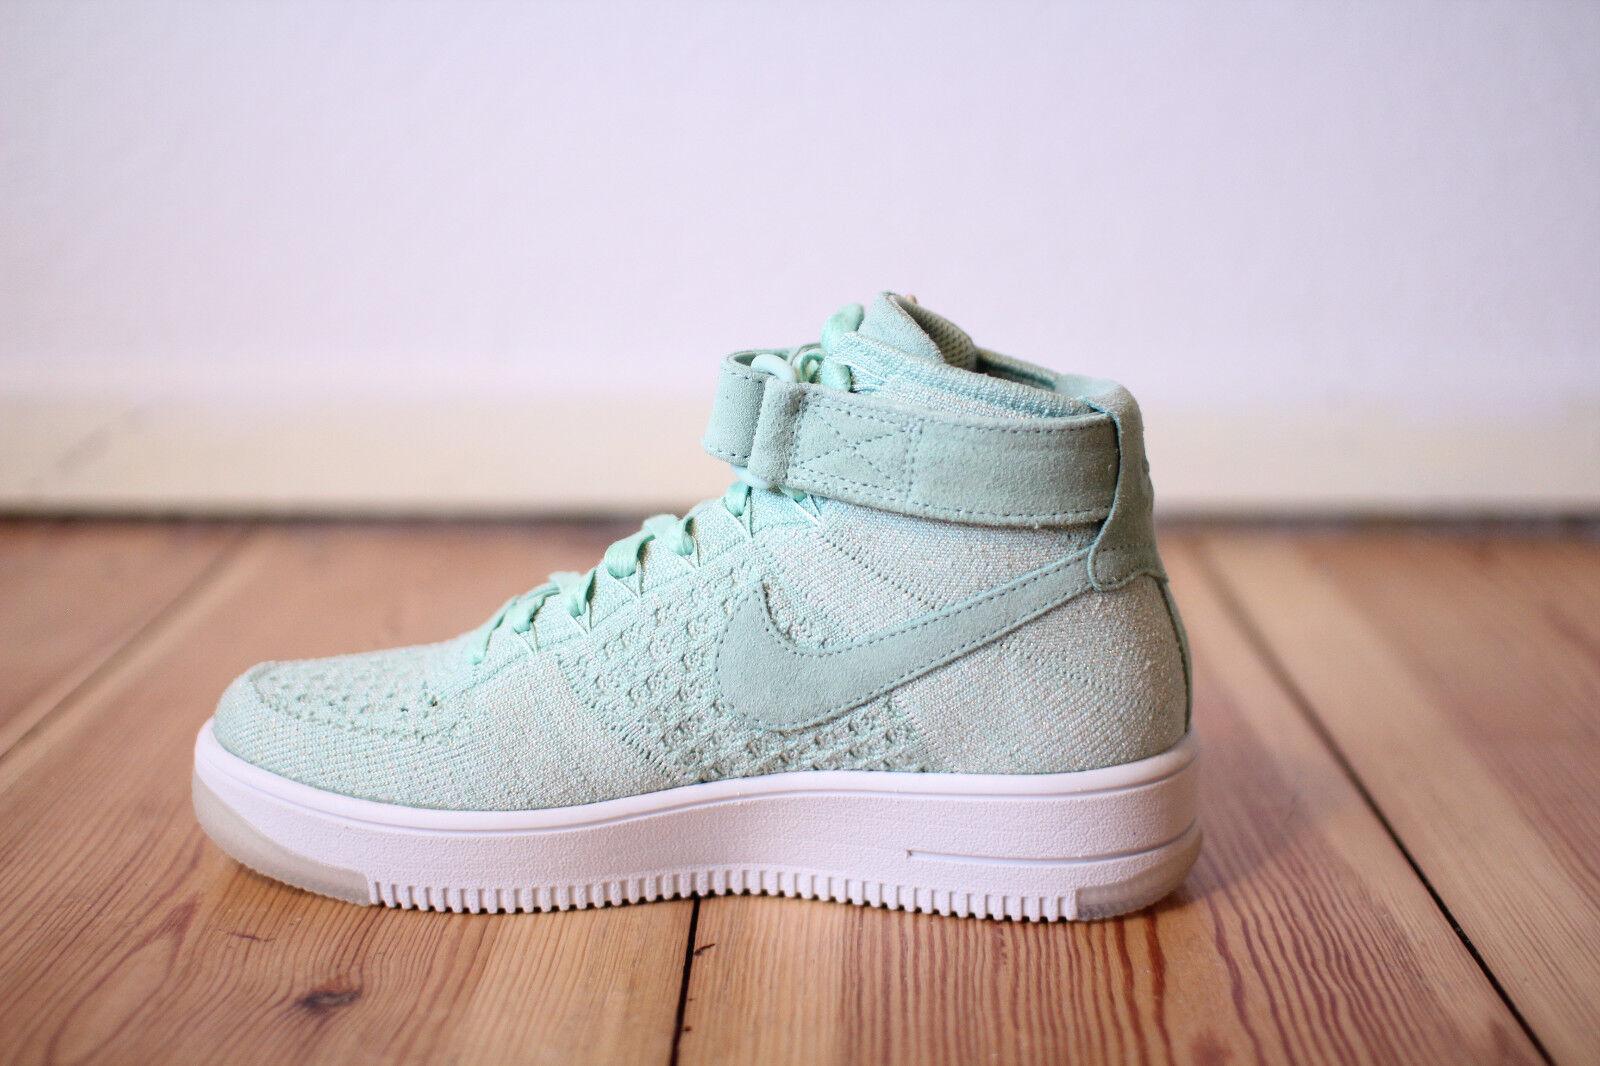 san francisco 81899 b65ef ... Nike SB Zoom Stefan Janoski Janoski Janoski Canvas Mens 615957-304  Sequoia Skate Shoes Size ...